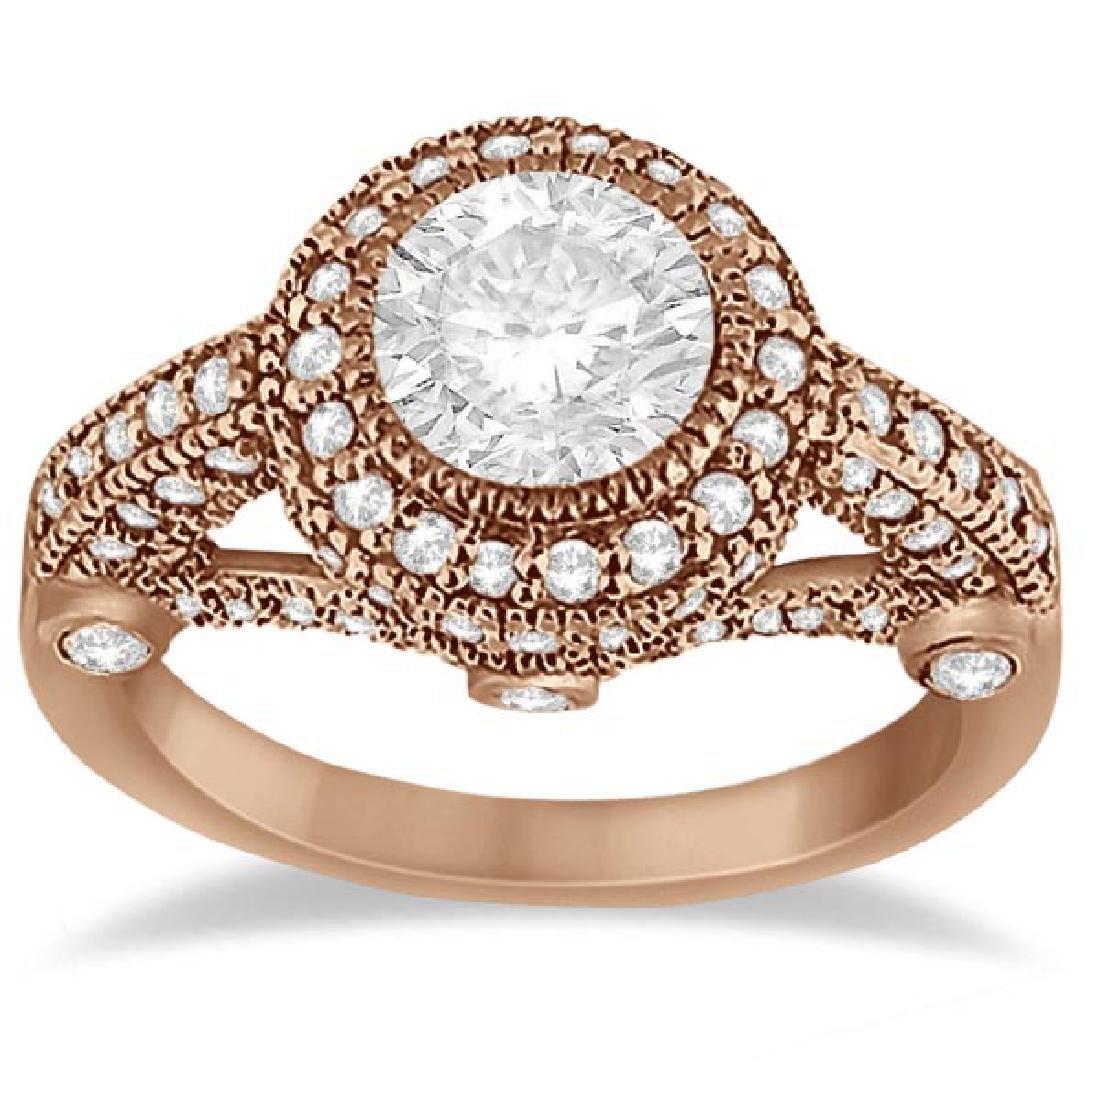 Vintage Diamond Halo Art Deco Engagement Ring 18k Rose